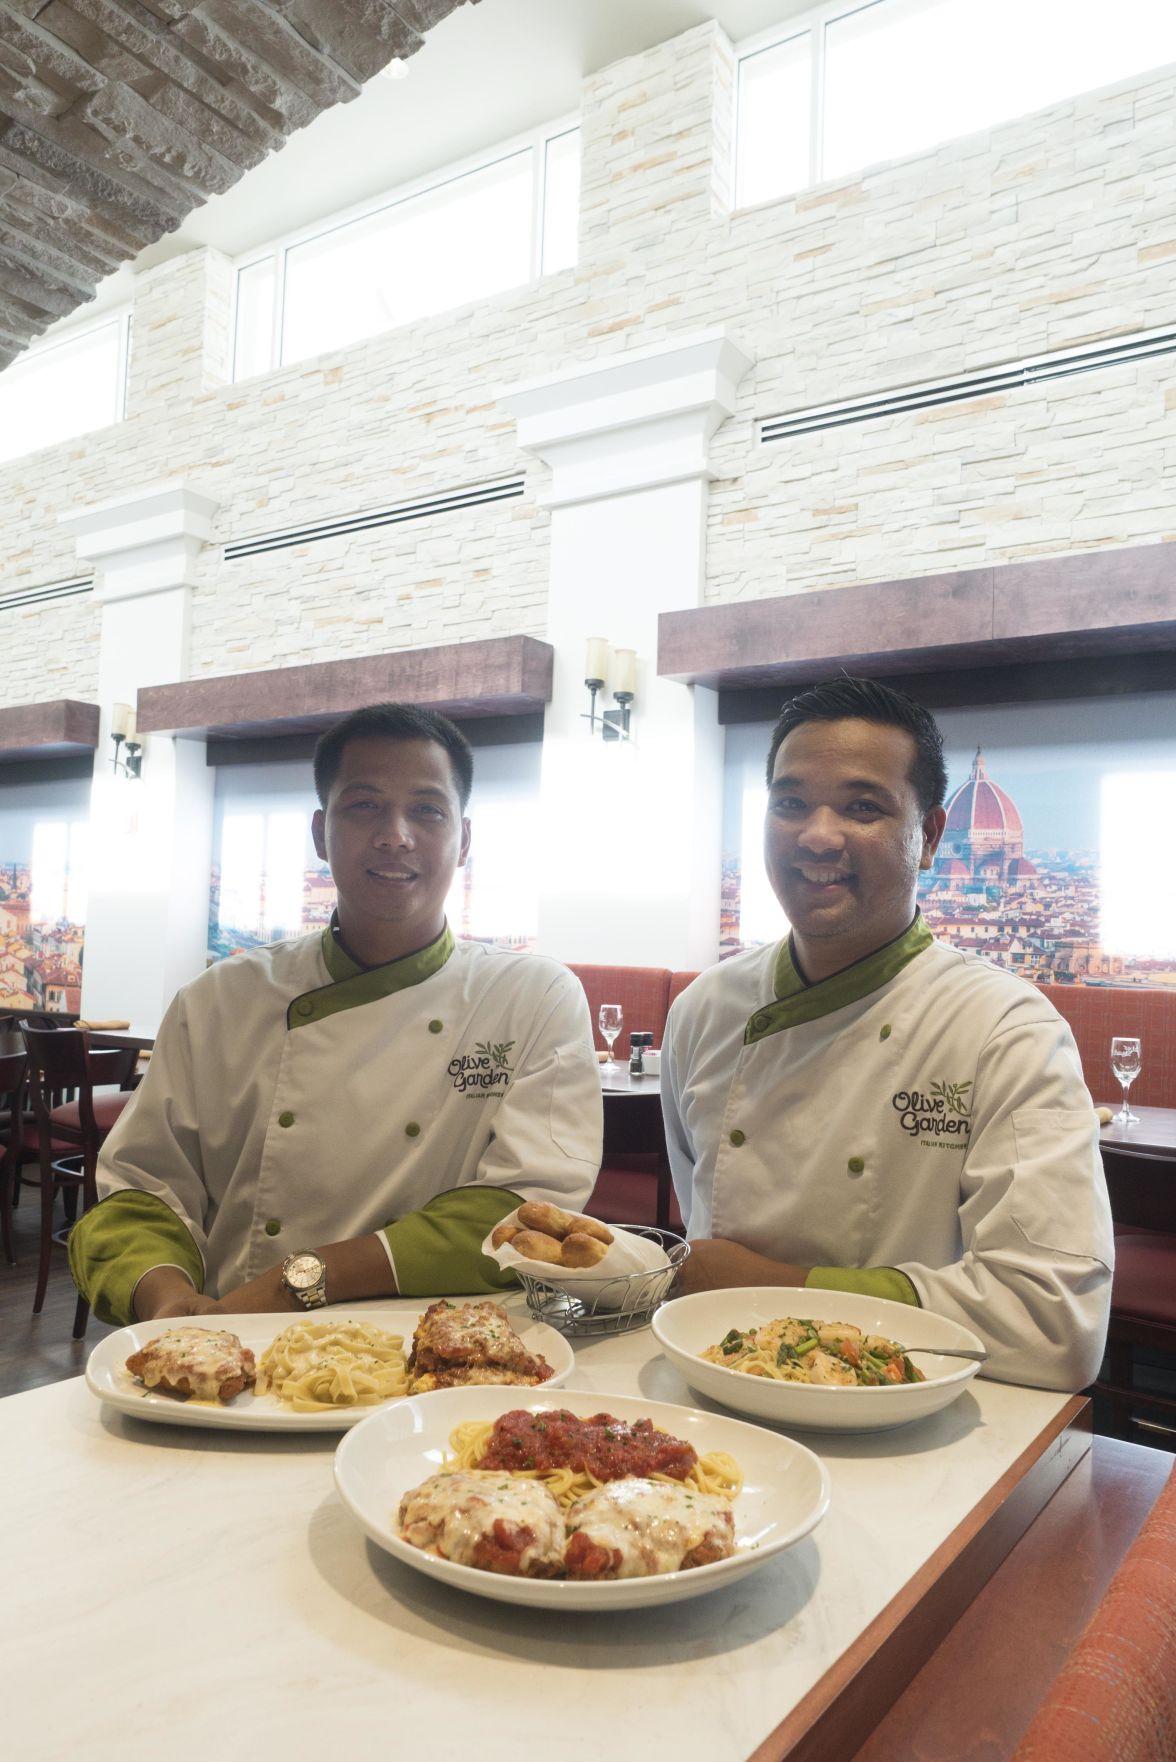 Olive Garden opens today in Tumon   Guam News   postguam.com